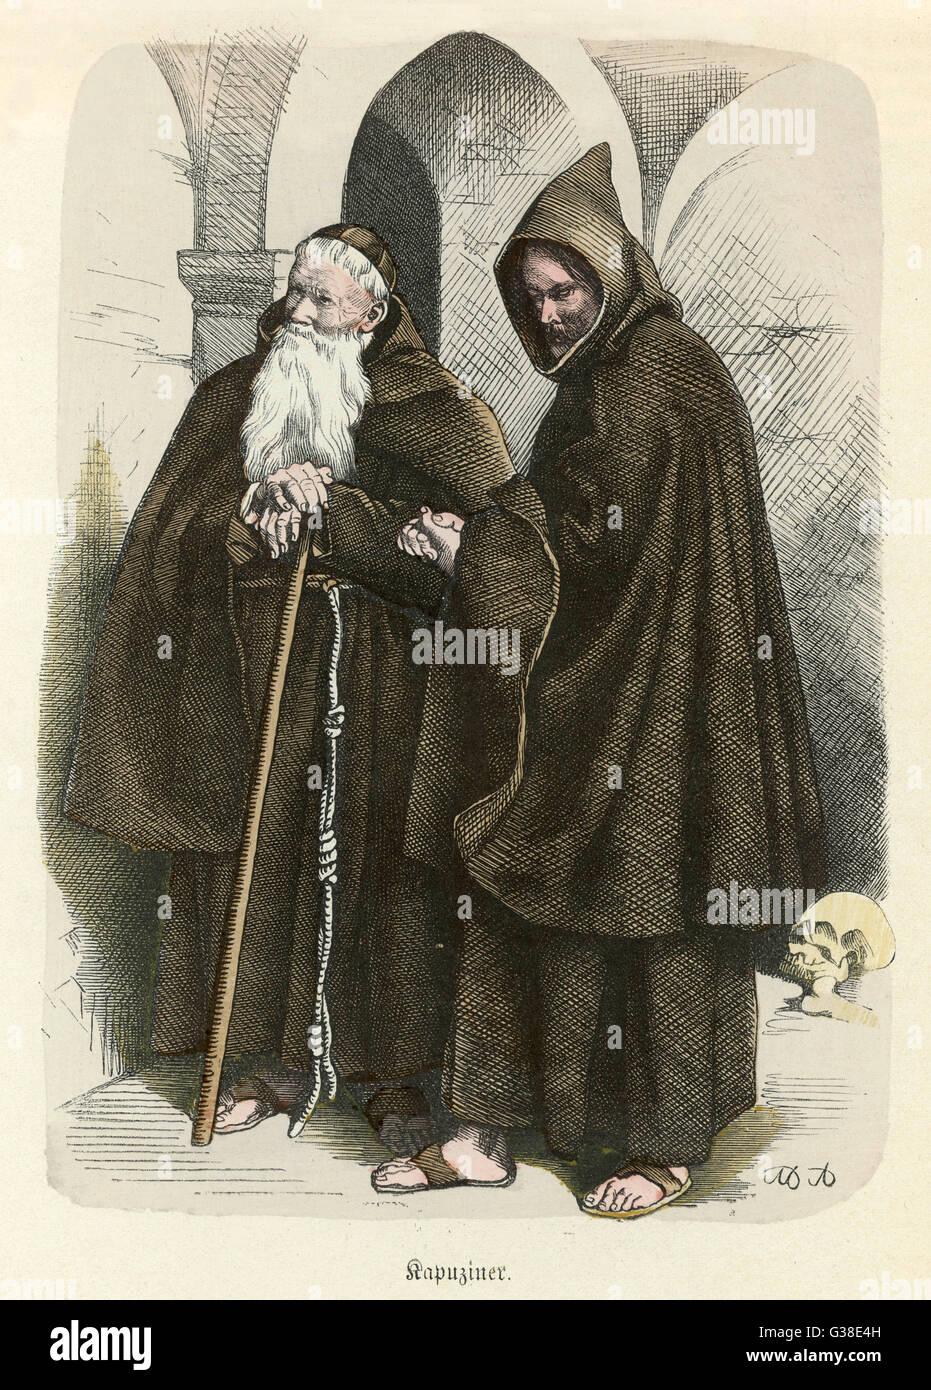 KAPUZINER - FRANZISKANER-MÖNCHEN DER NEUEN REGEL 1528 Stockbild